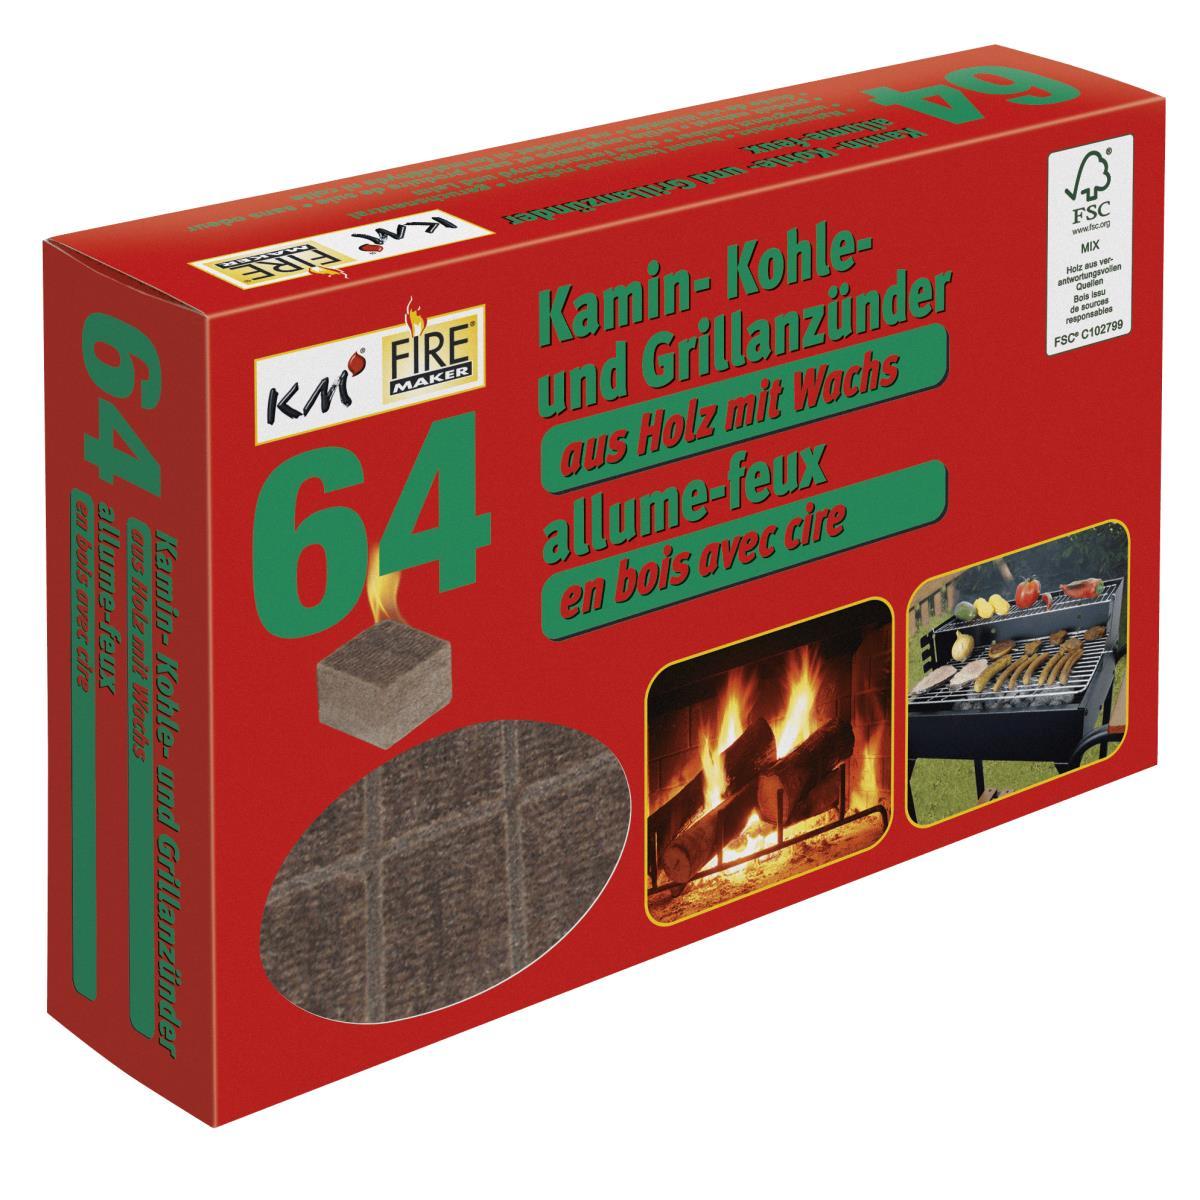 Kaminholzanzünder Kaminanzünder Kohleanzünder Grillanzünder  Ofenanzünder Holz,K M,0000272, 4004753902723